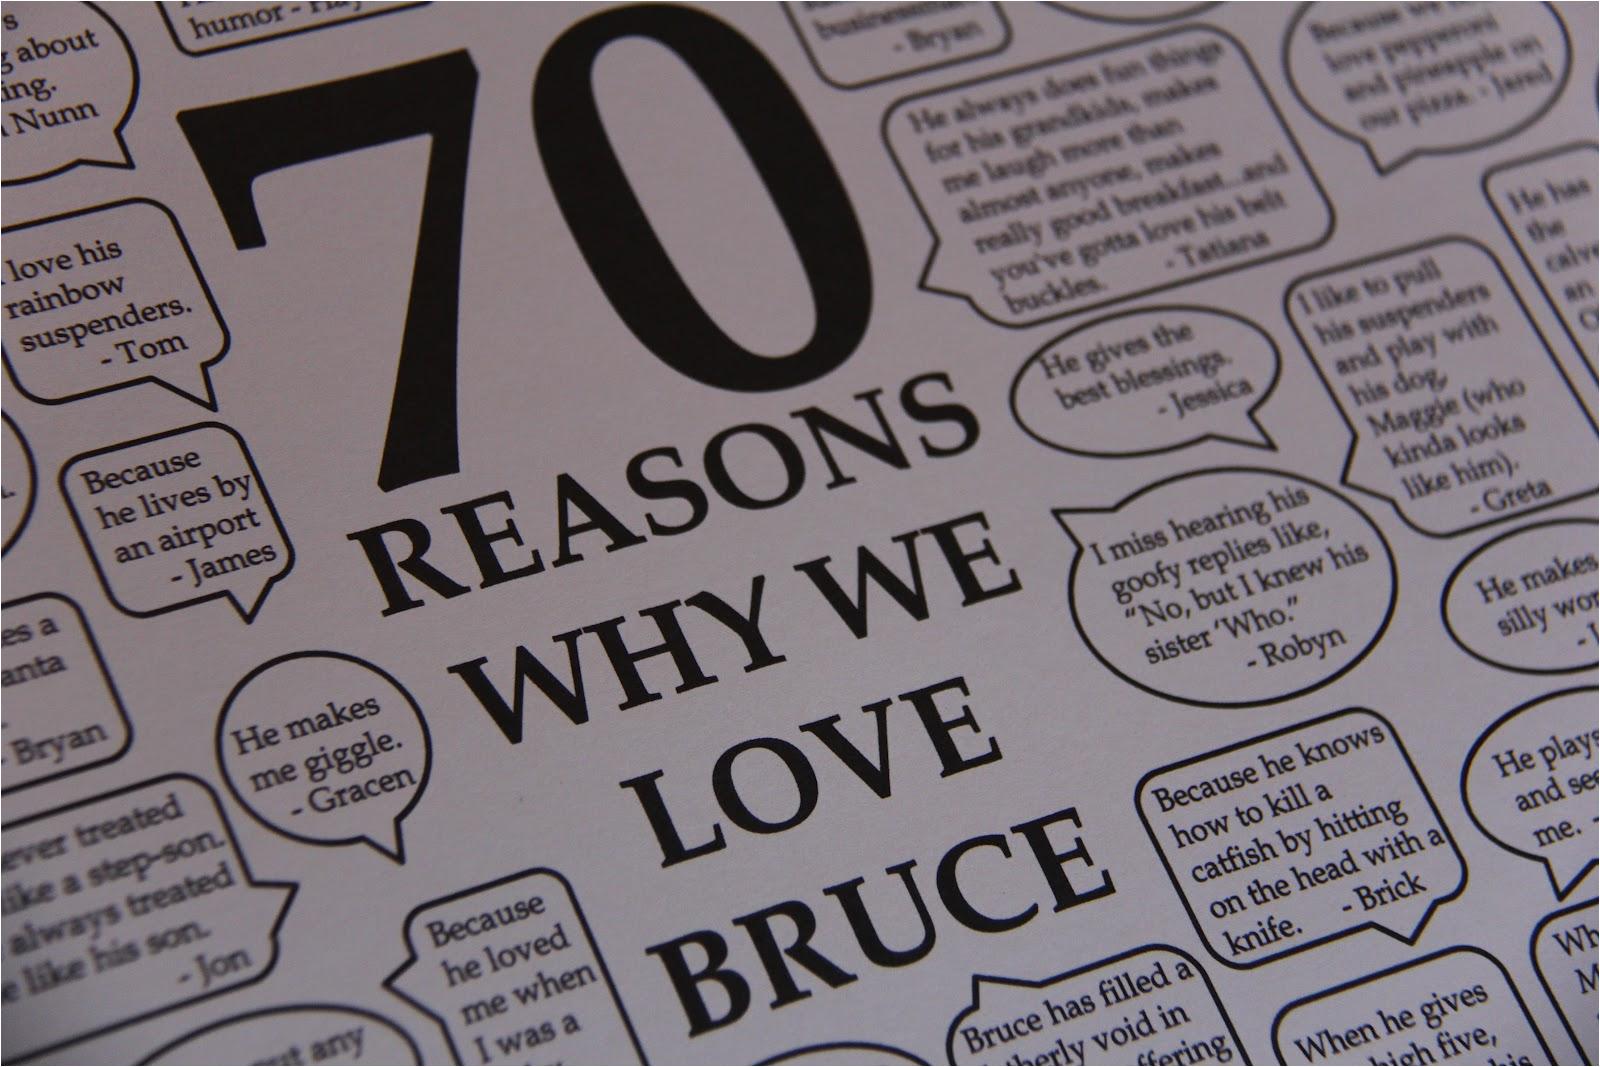 70th birthday themes ideas